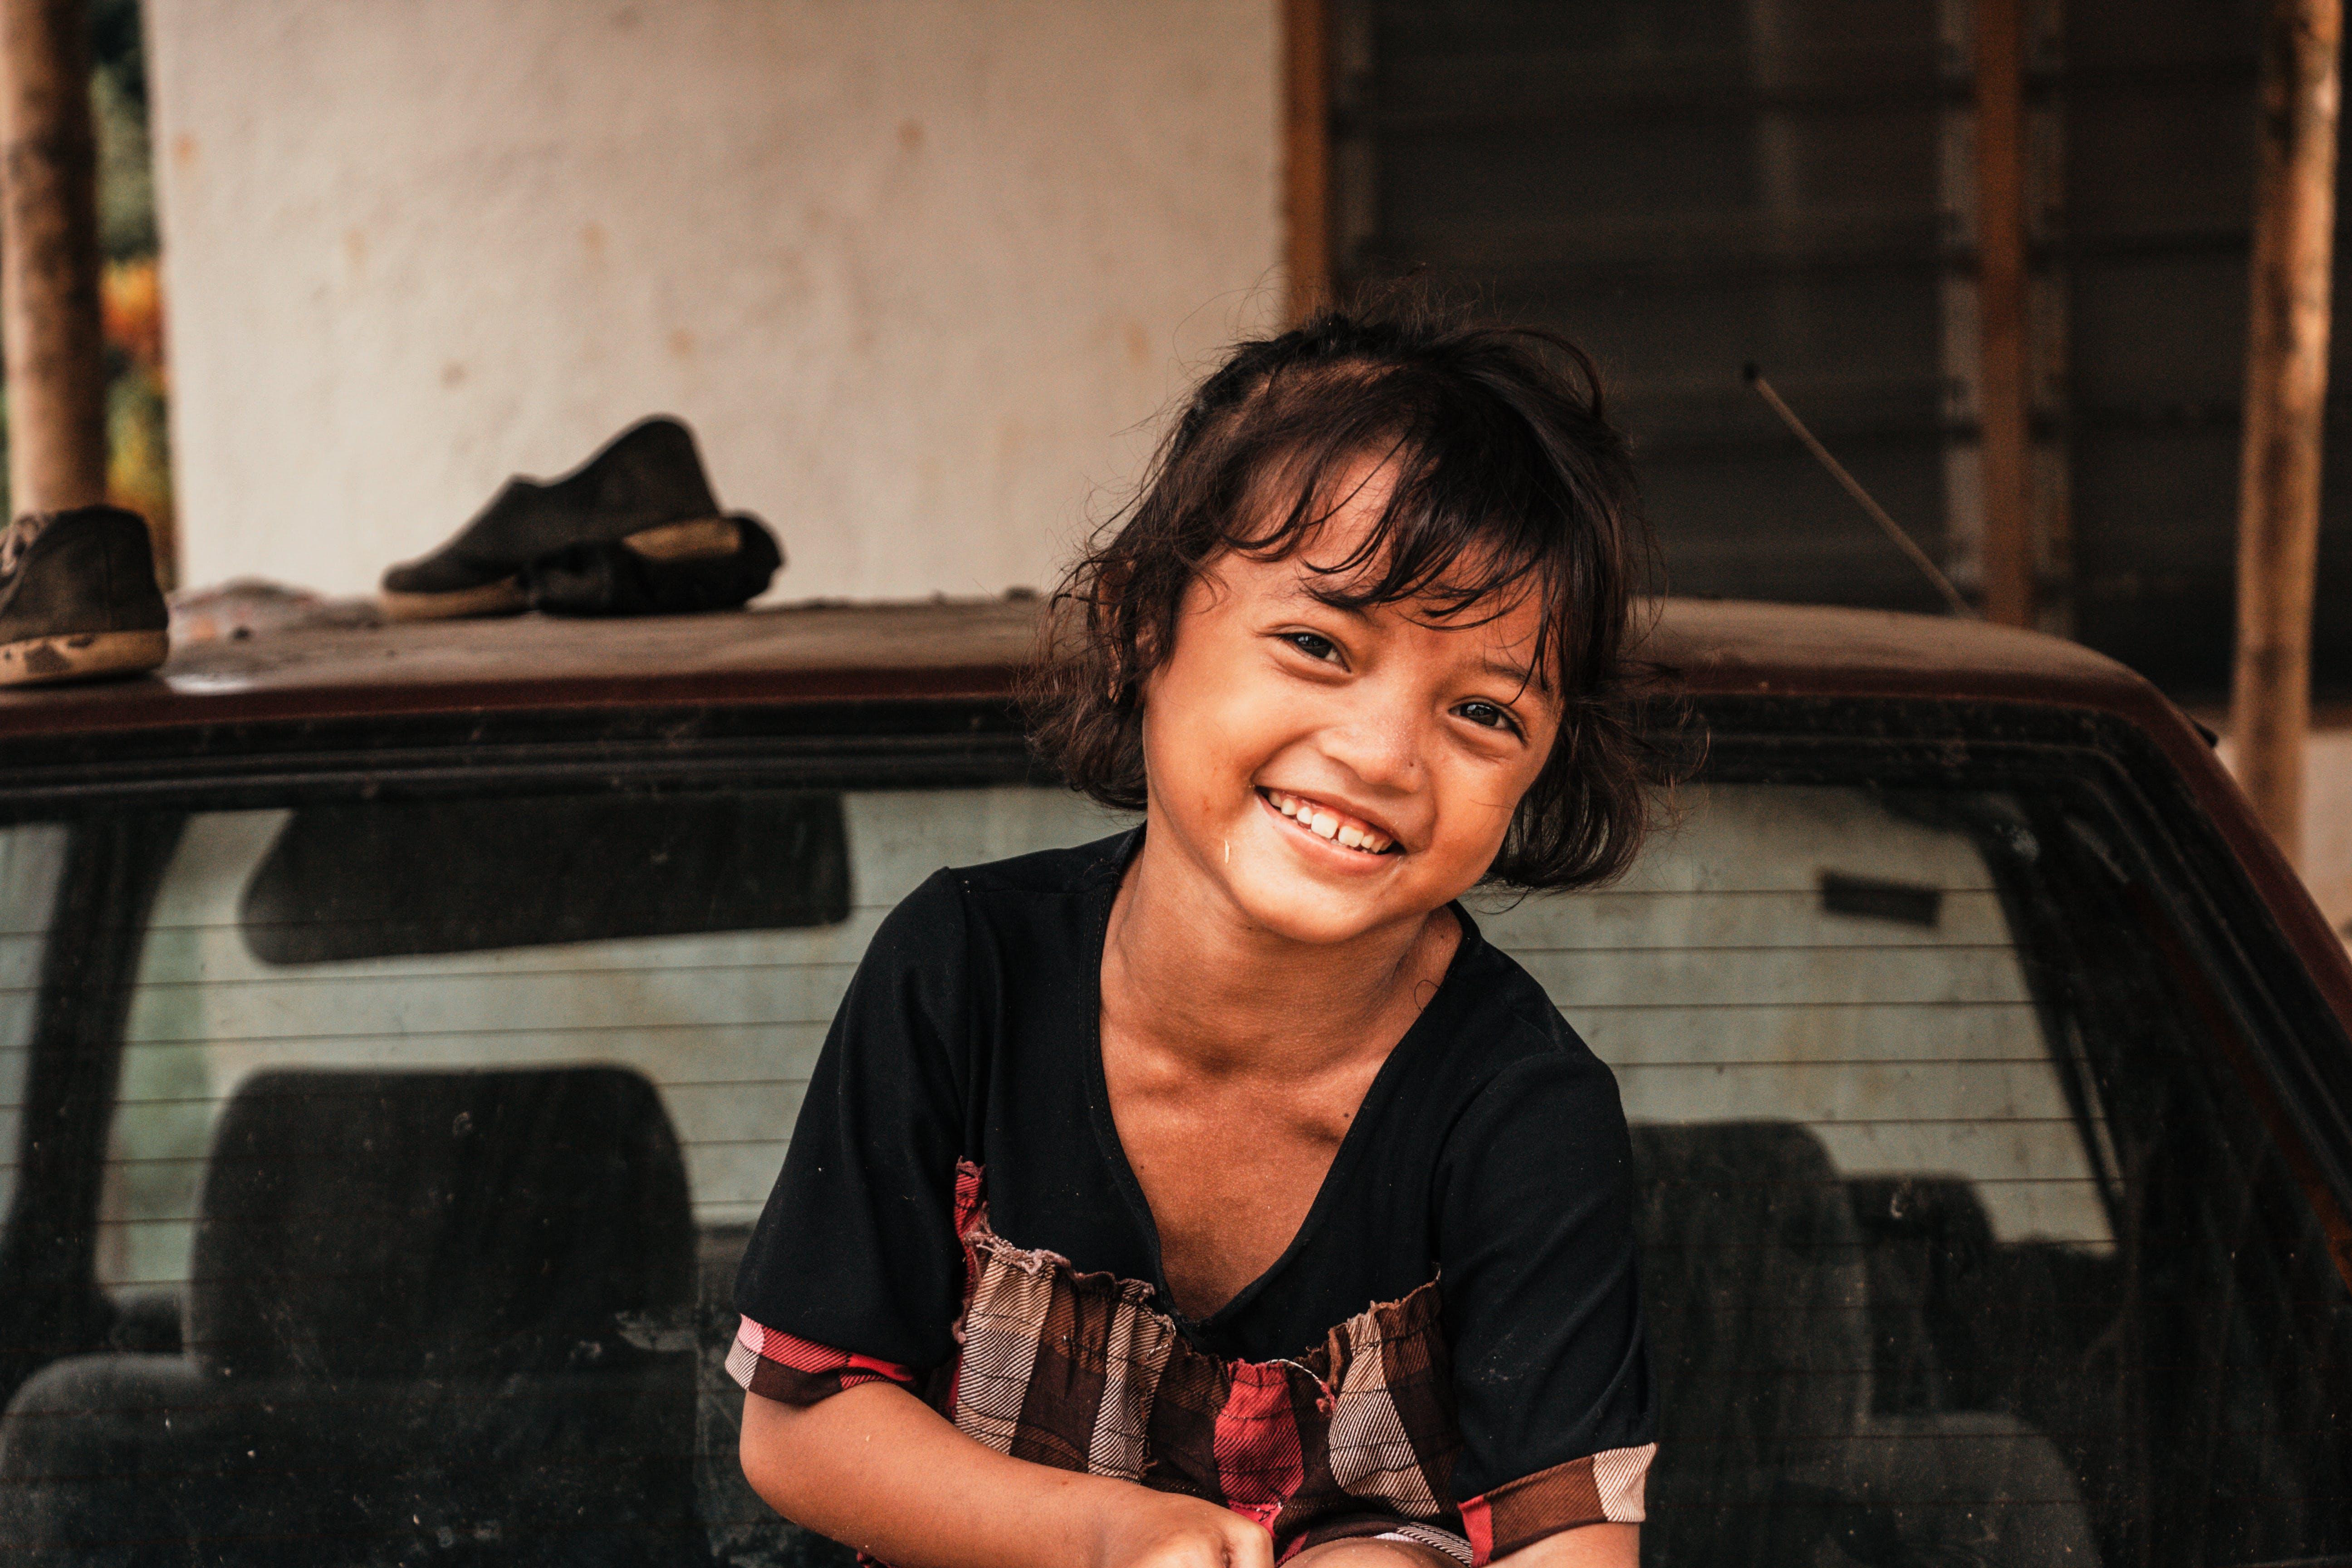 Smiling Girl Sitting Top of Vehicle